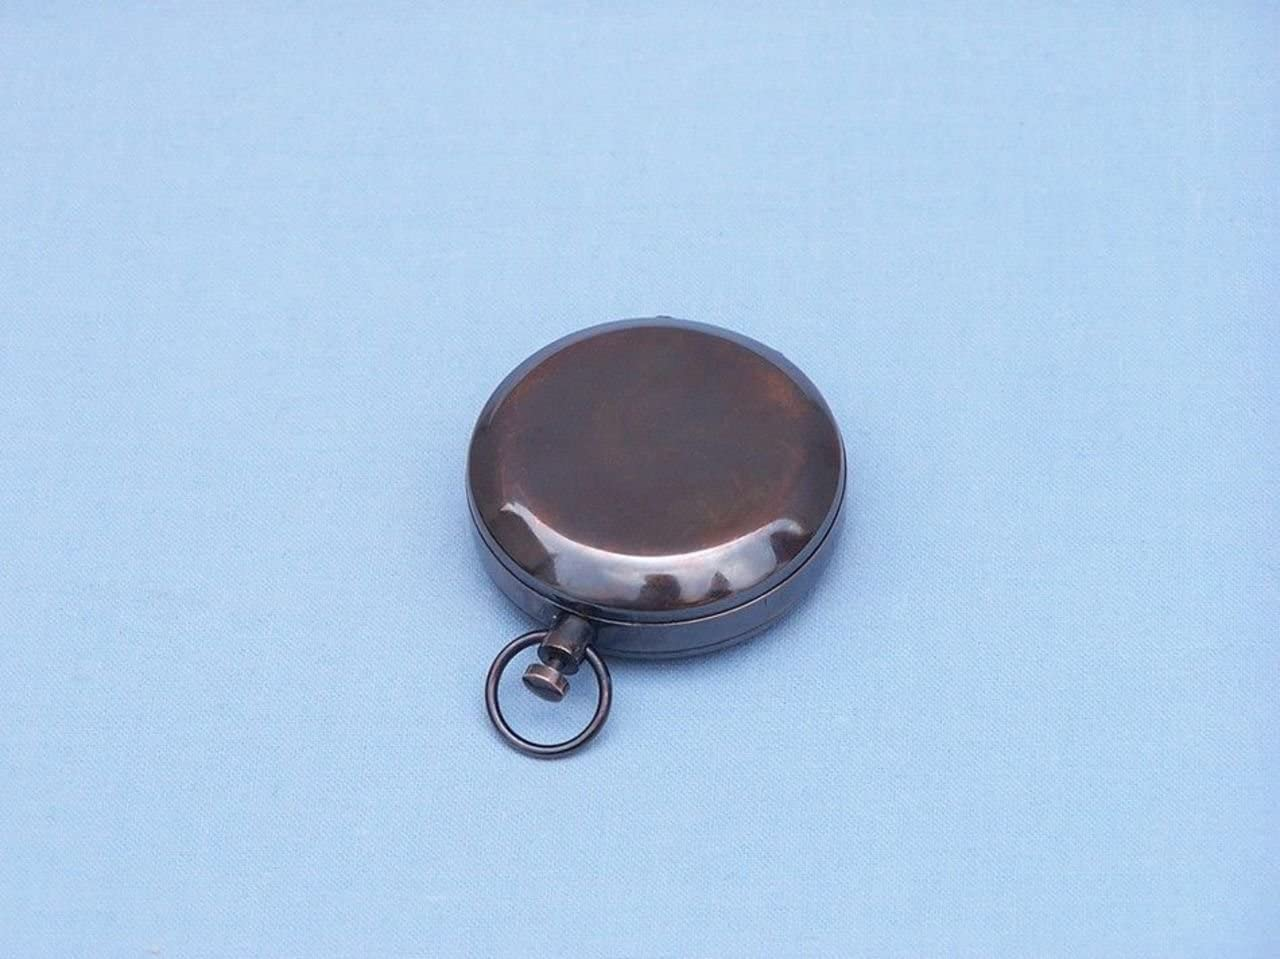 2 Hampton Nautical 3xglass-101 Antique Copper Scouts Push Button Compass 2 Nautical Home Decoration